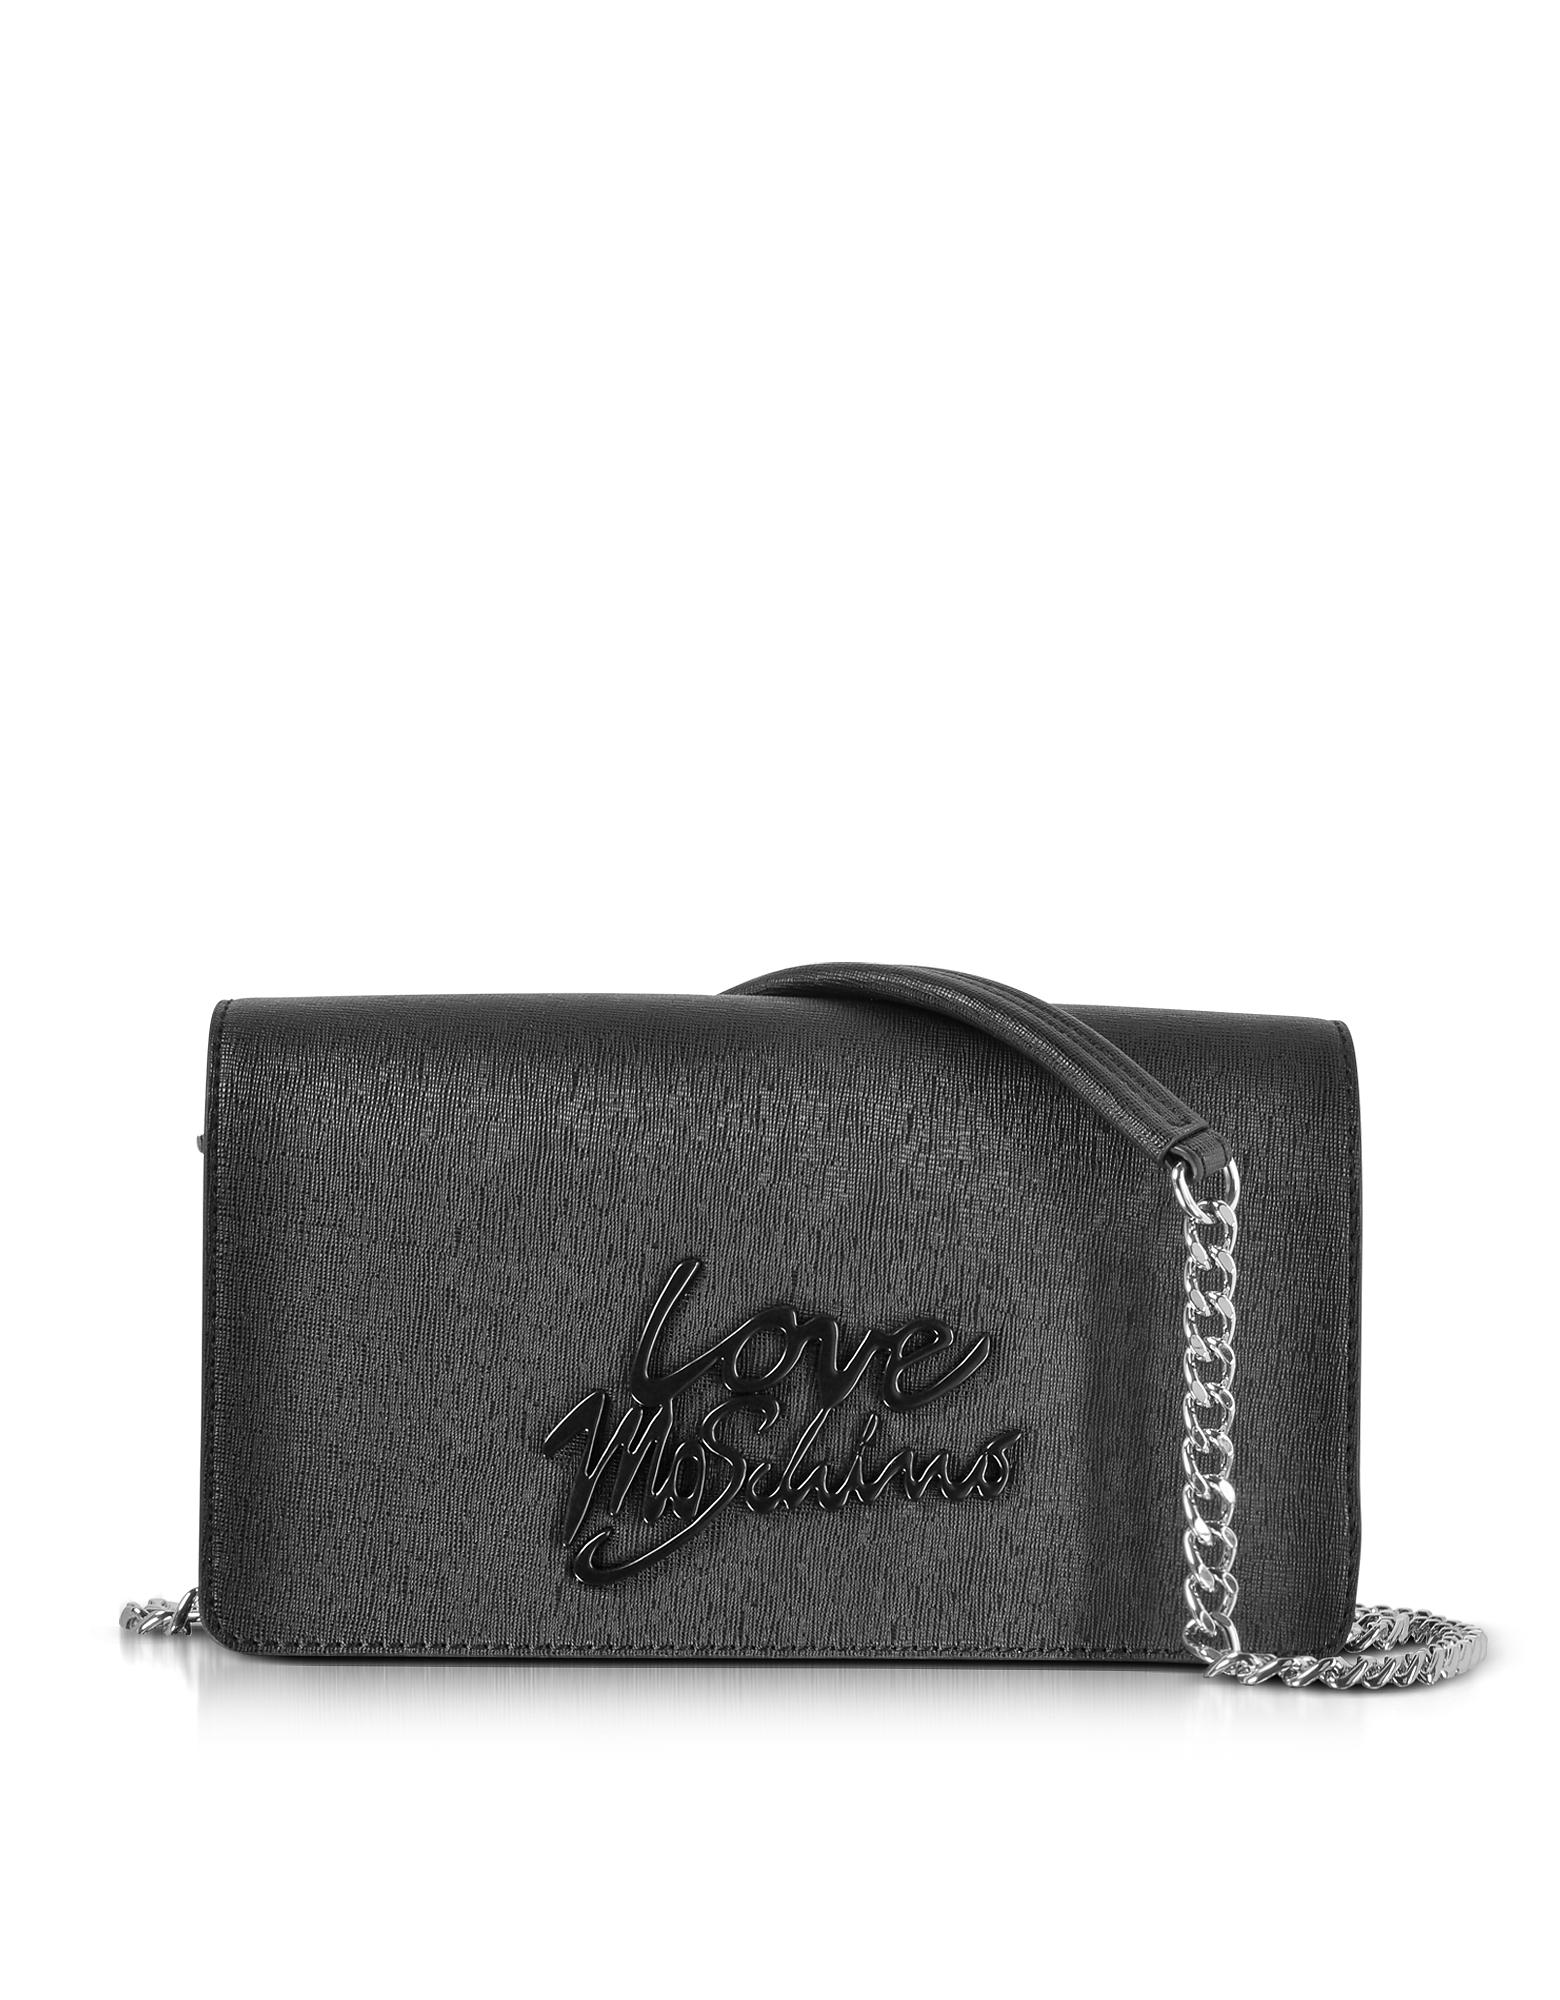 Love Moschino Handbags, Black Saffiano Eco-Leather Clutch w/Foulard